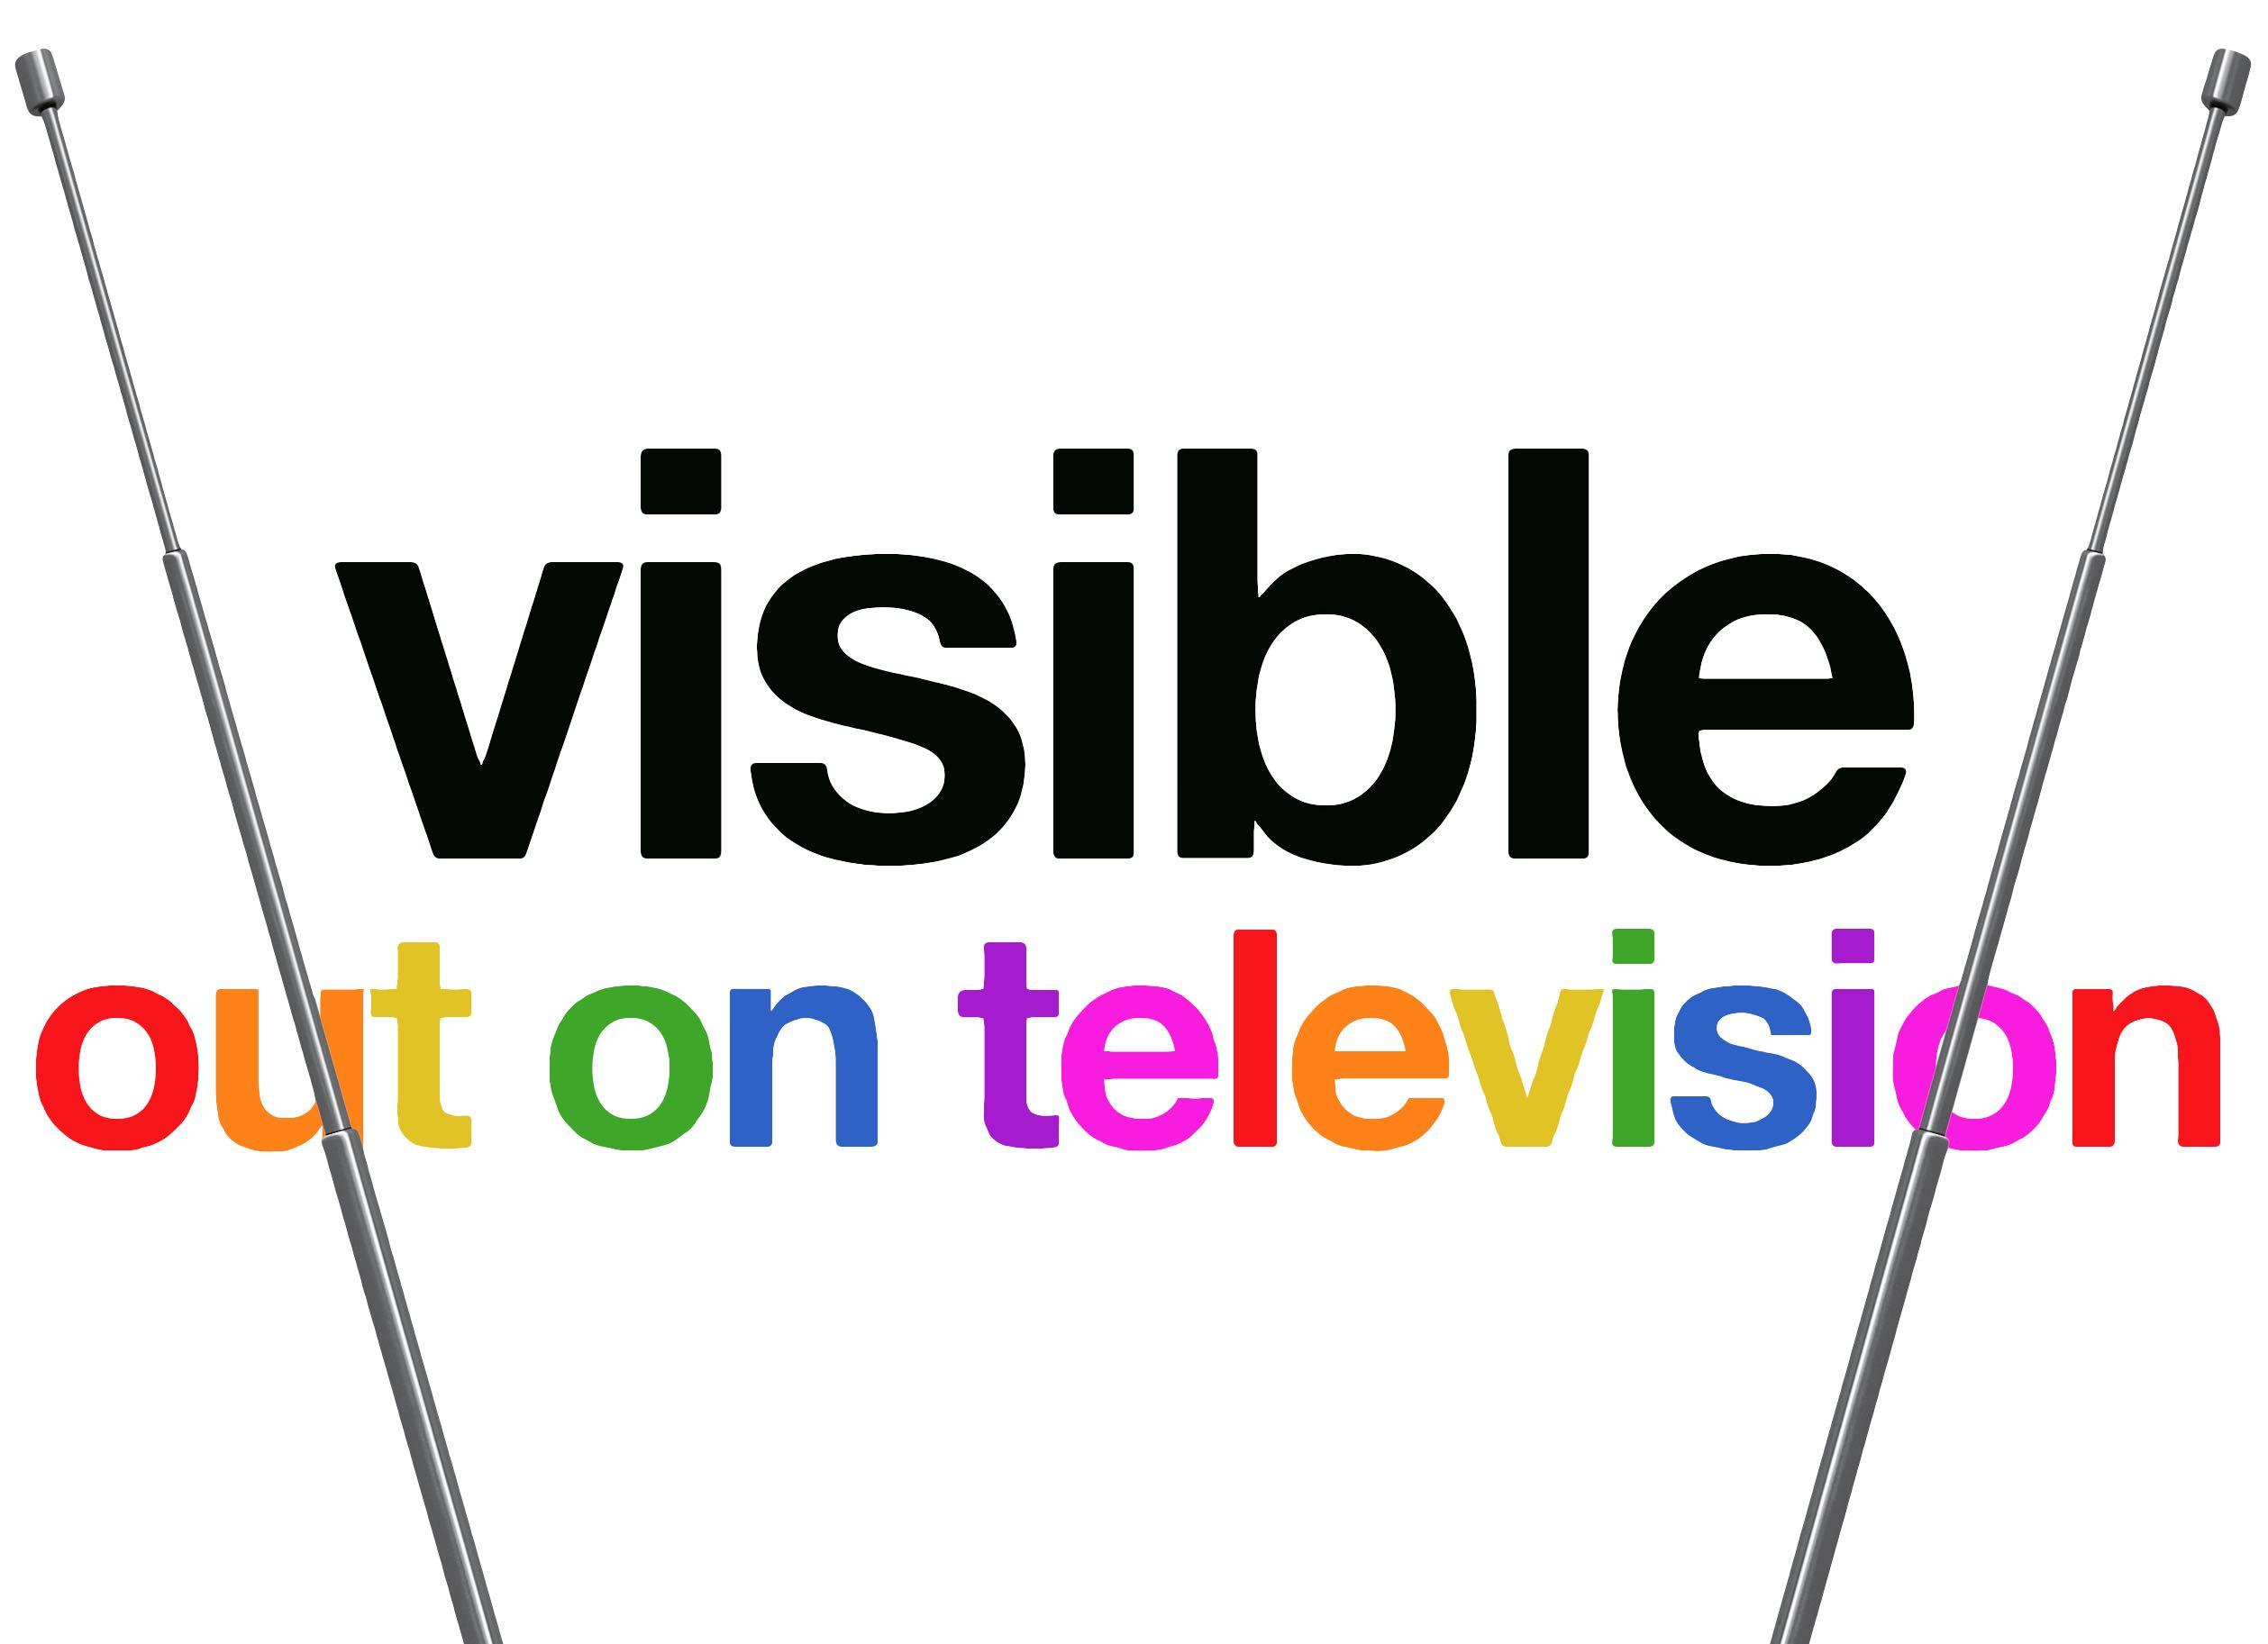 https://media.idownloadblog.com/wp-content/uploads/2020/02/Visible-Out-on-Television-poster-artwork-001.jpg